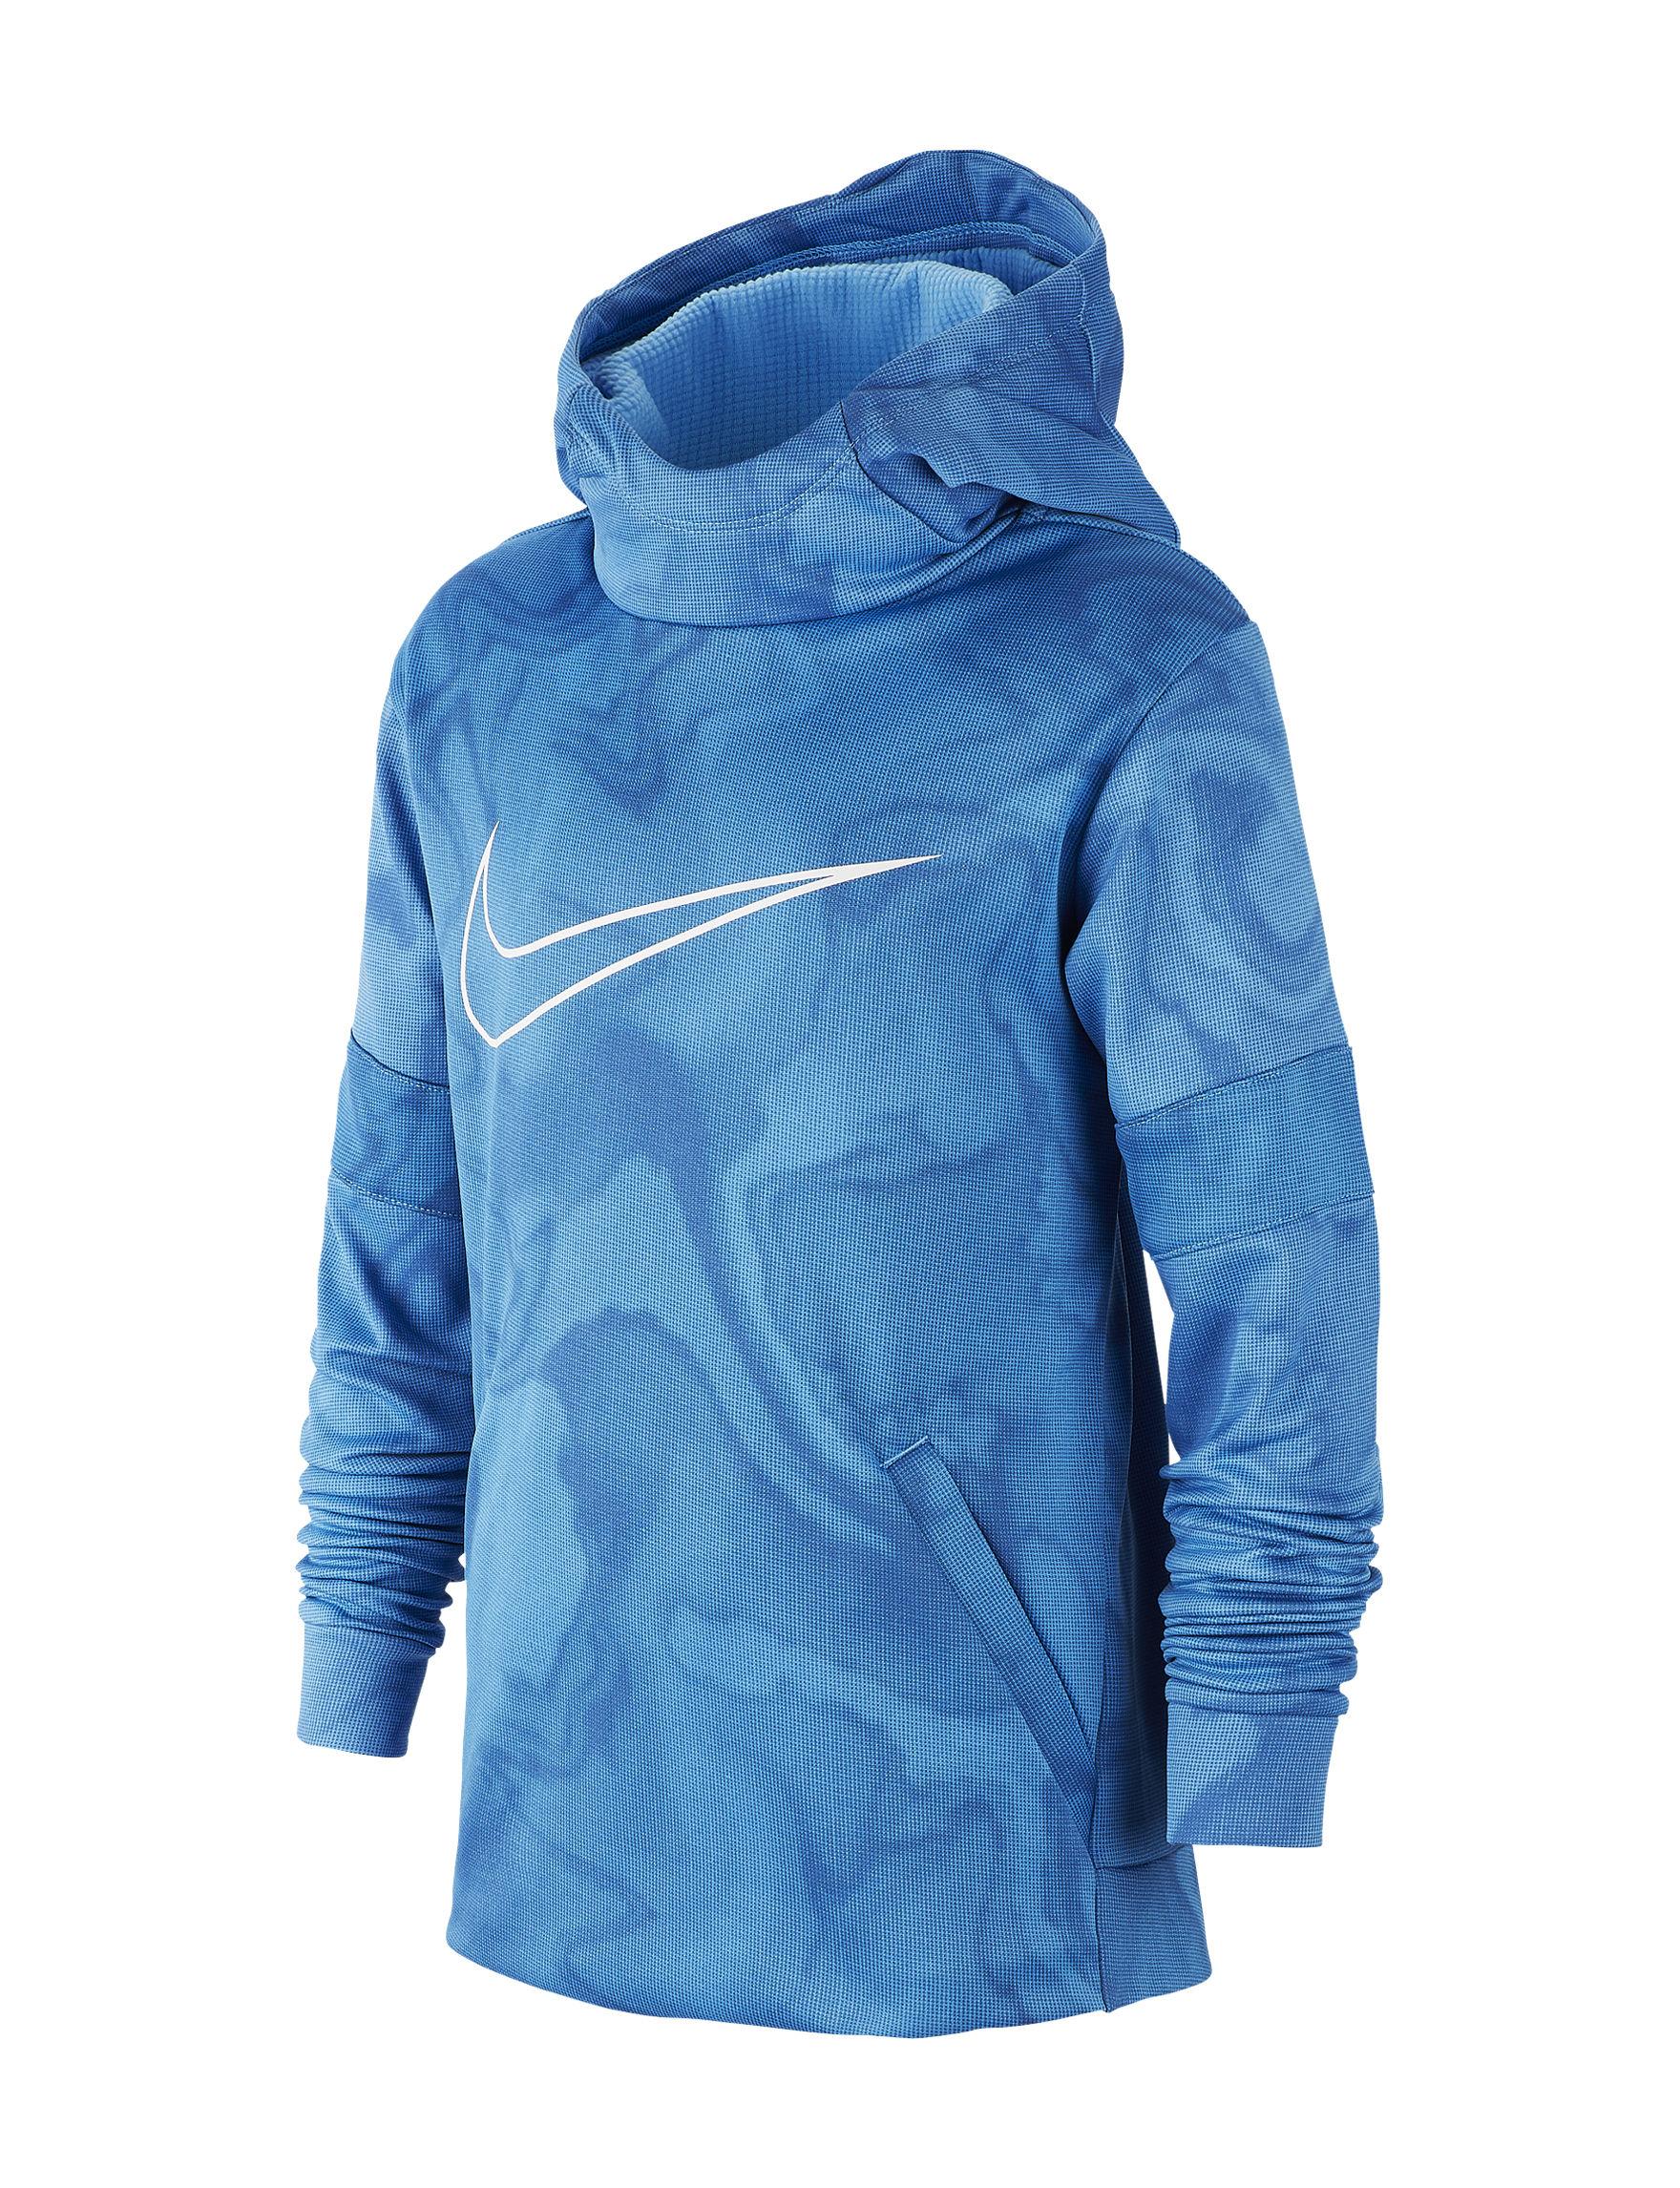 Nike Navy Heather